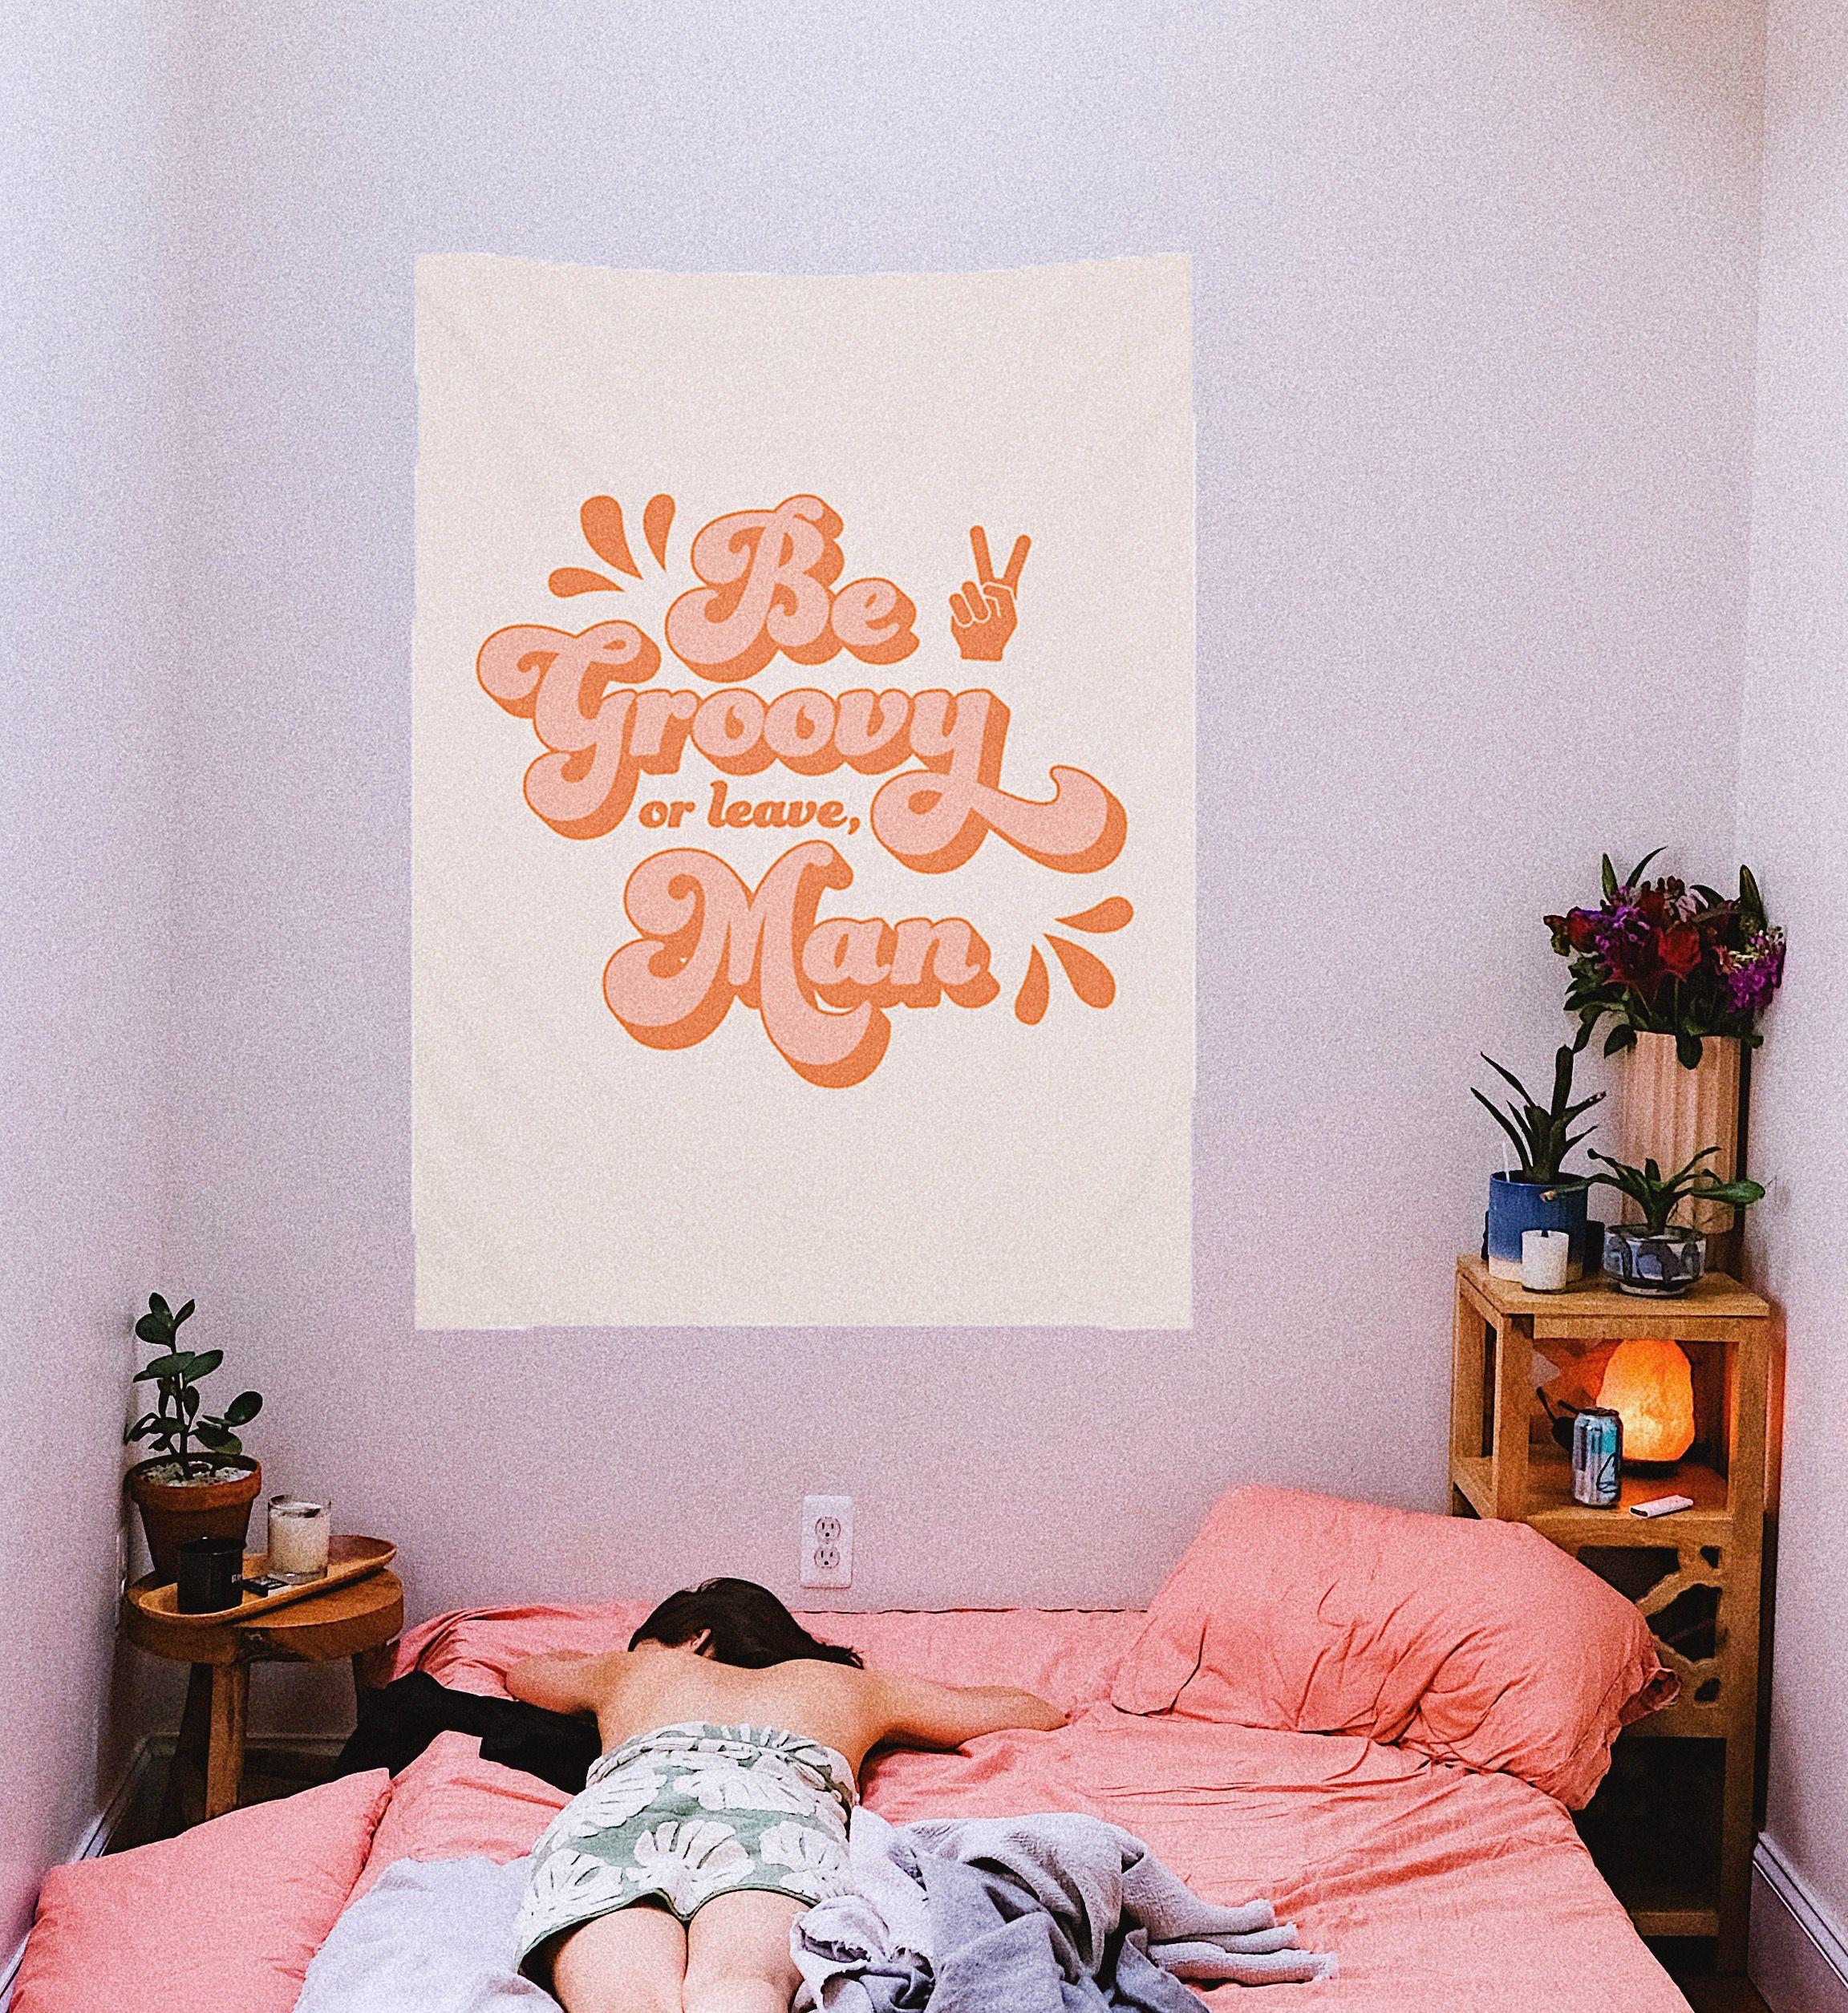 Spirit Tapestry Modern Bedroom Aesthetic Bedroom Bedroom Decor